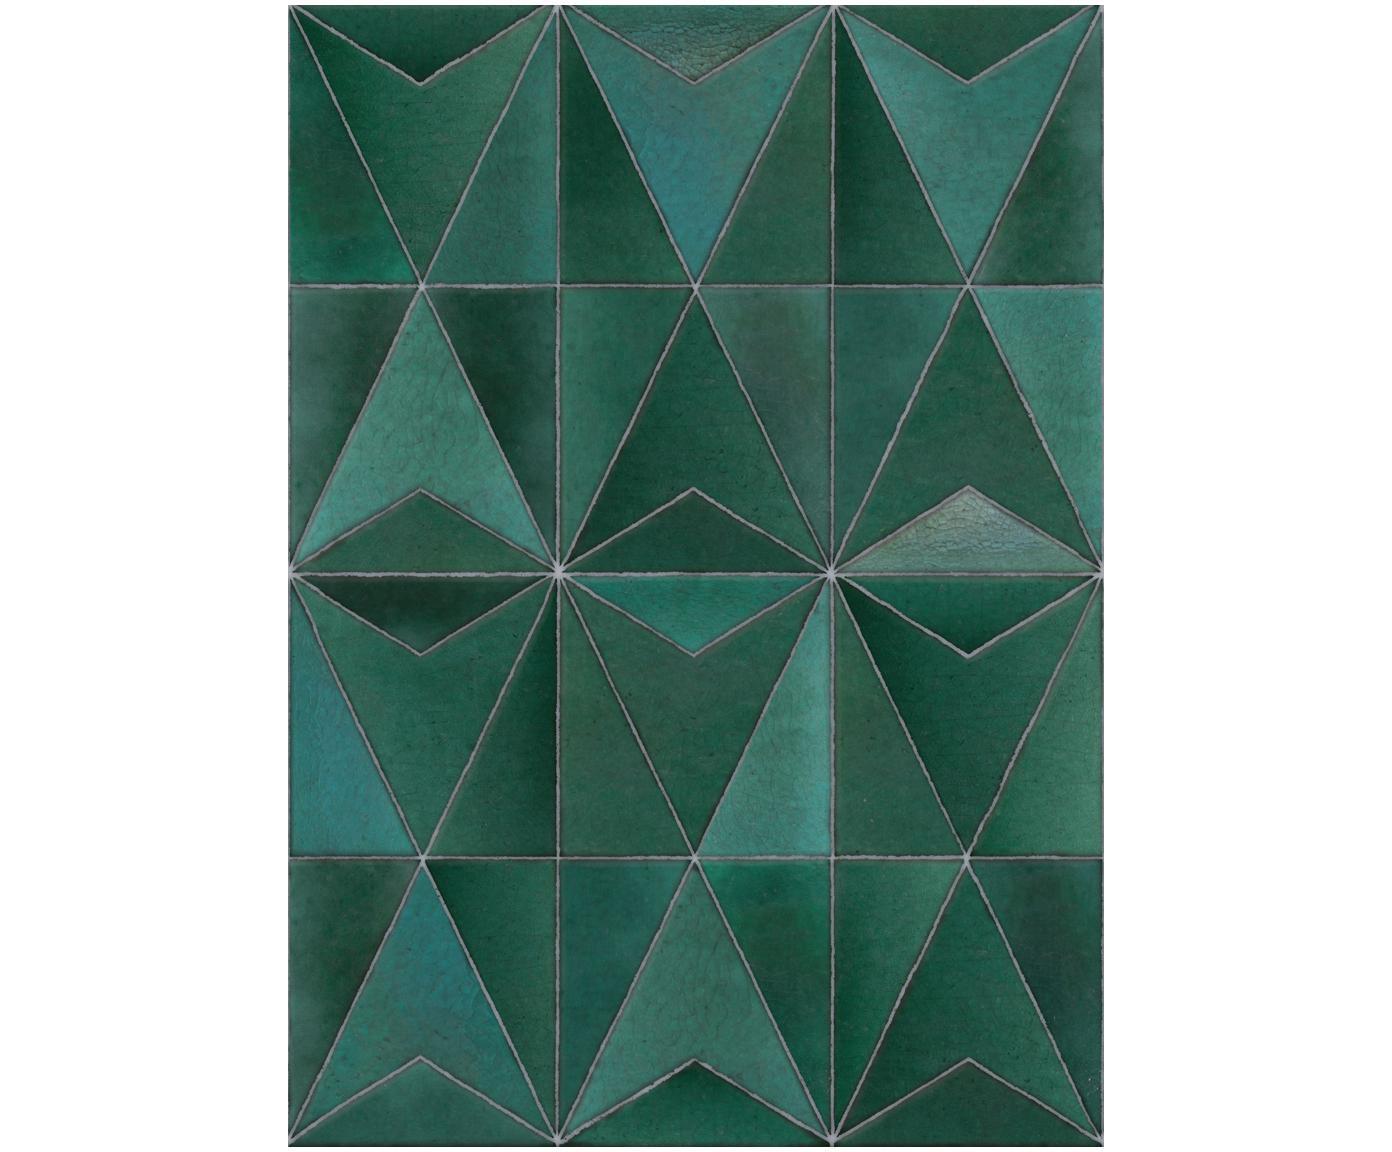 Adesivo murale Jade Green, Vello, Verde scuro, Larg. 200 x Alt. 280 cm